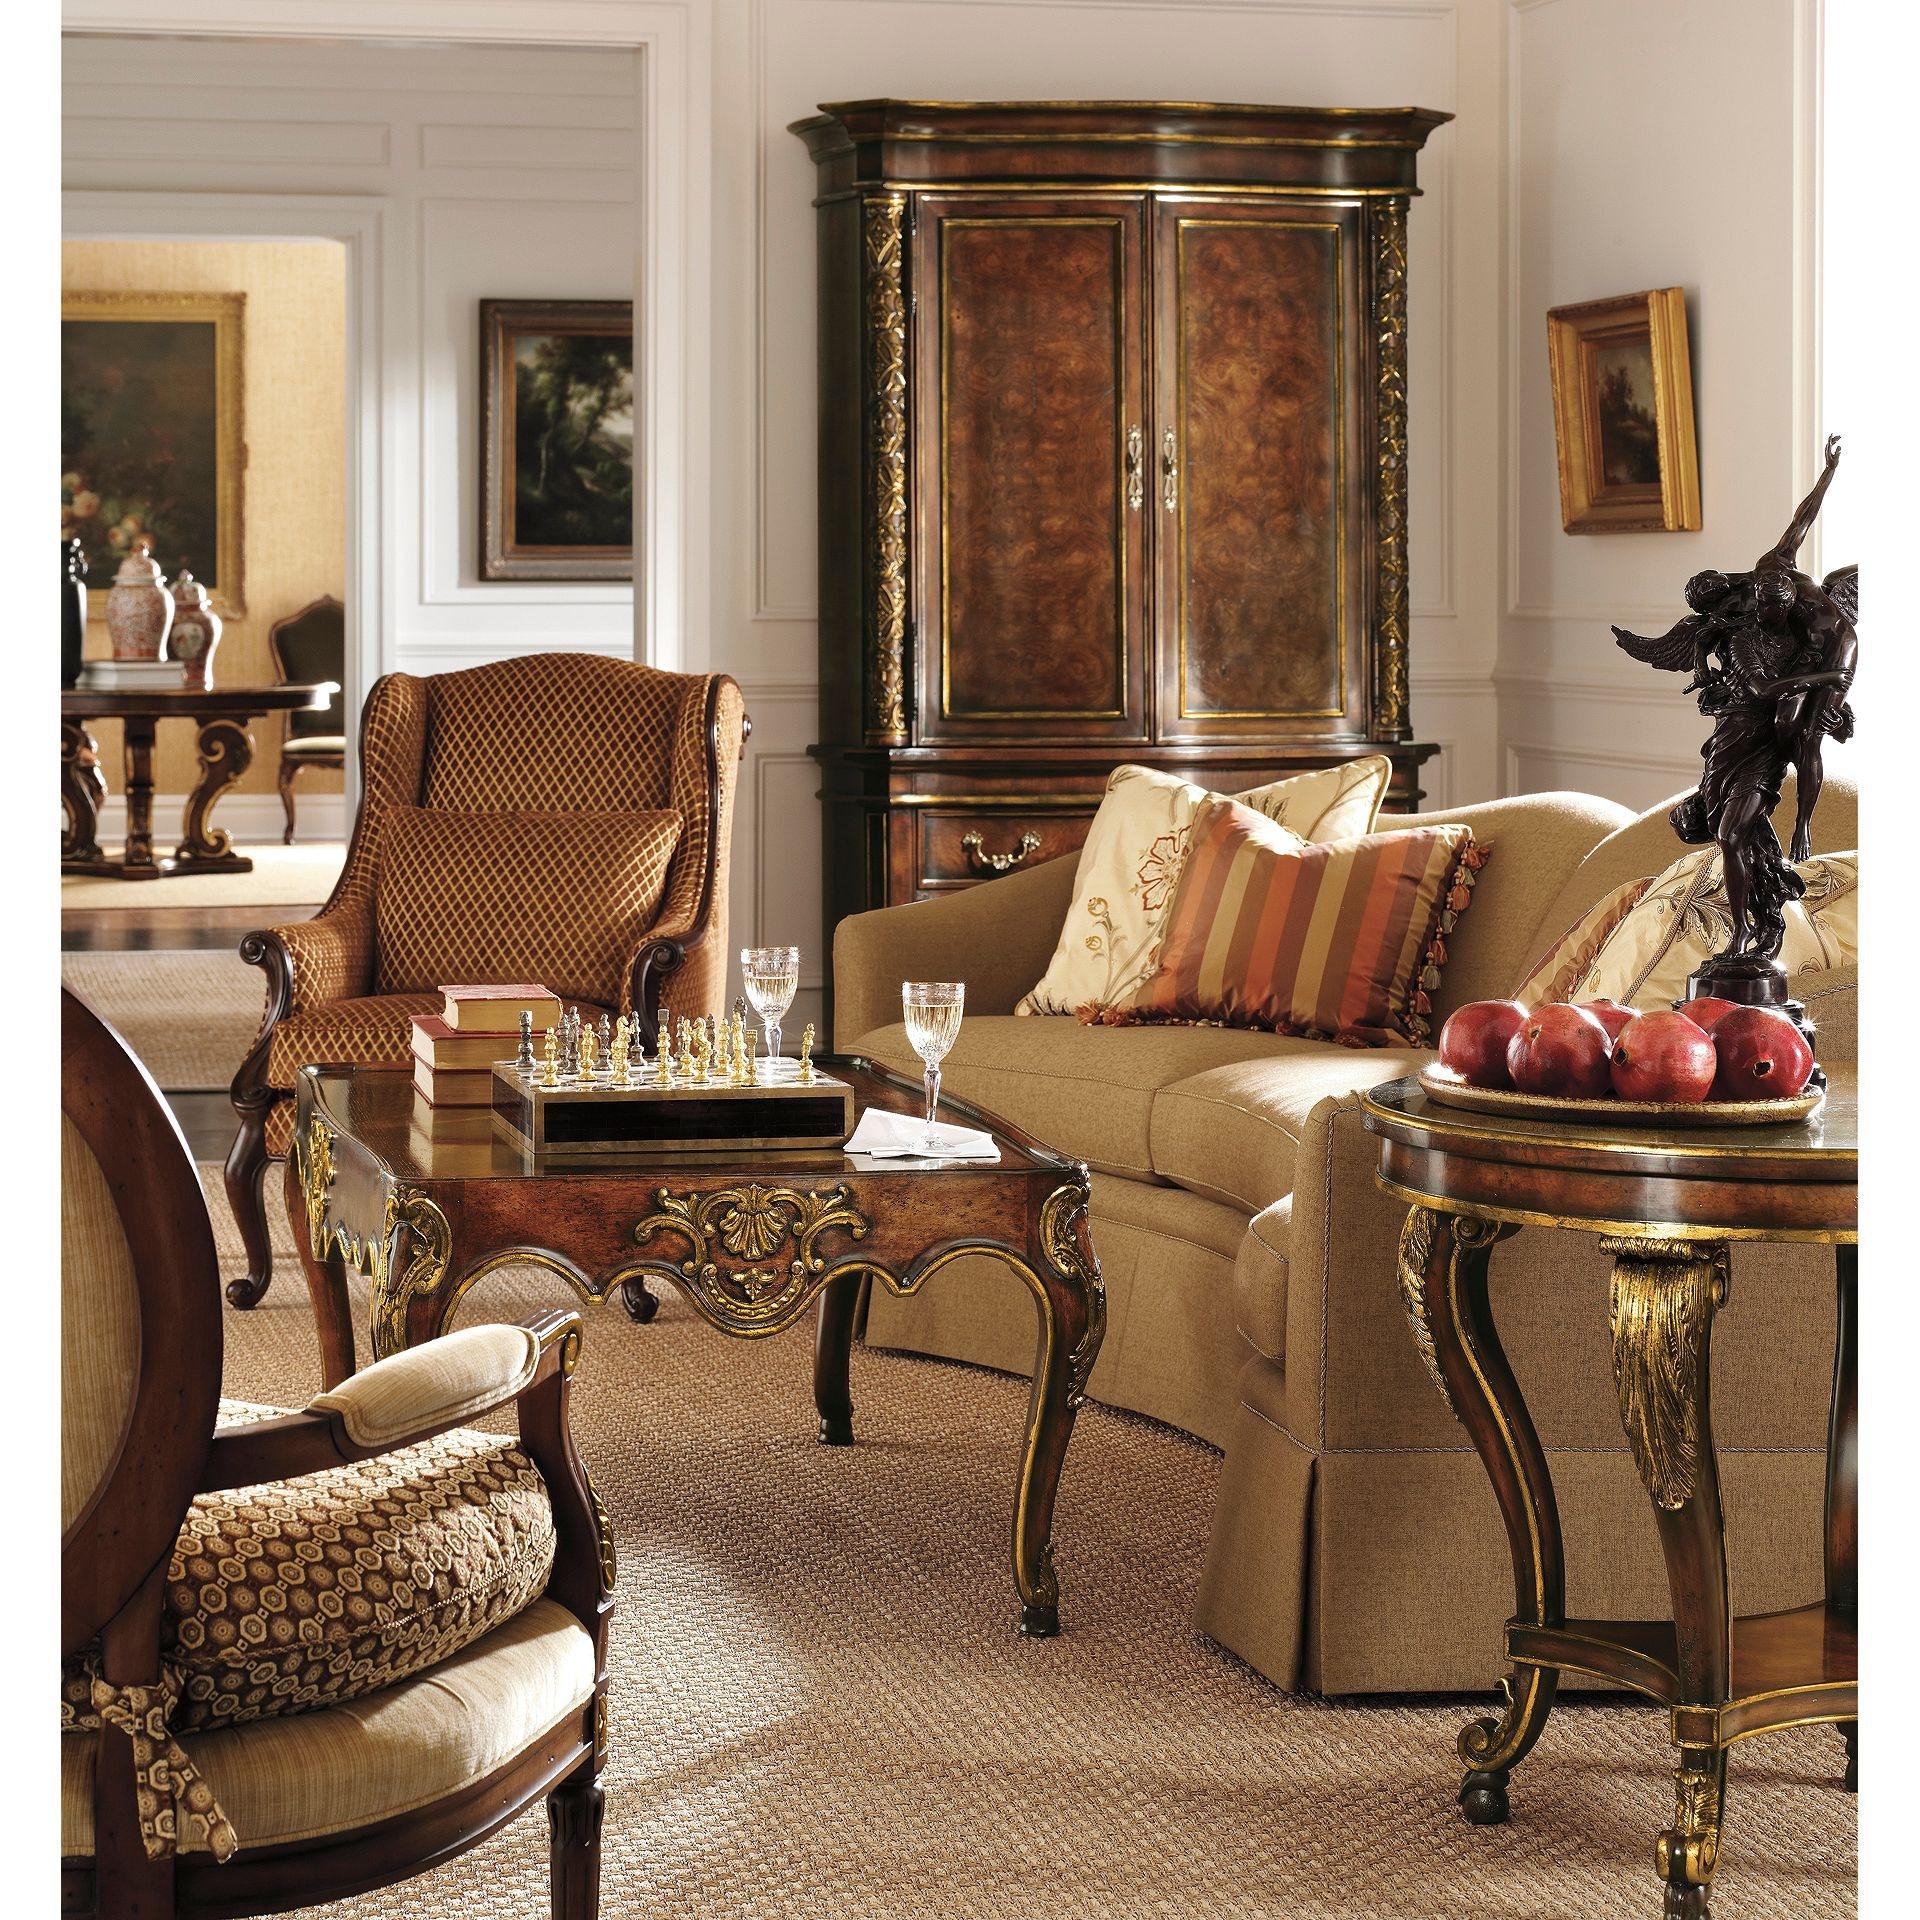 Henredon Furniture Henredon Upholstery Reflections Wedge Sofa H0814 W